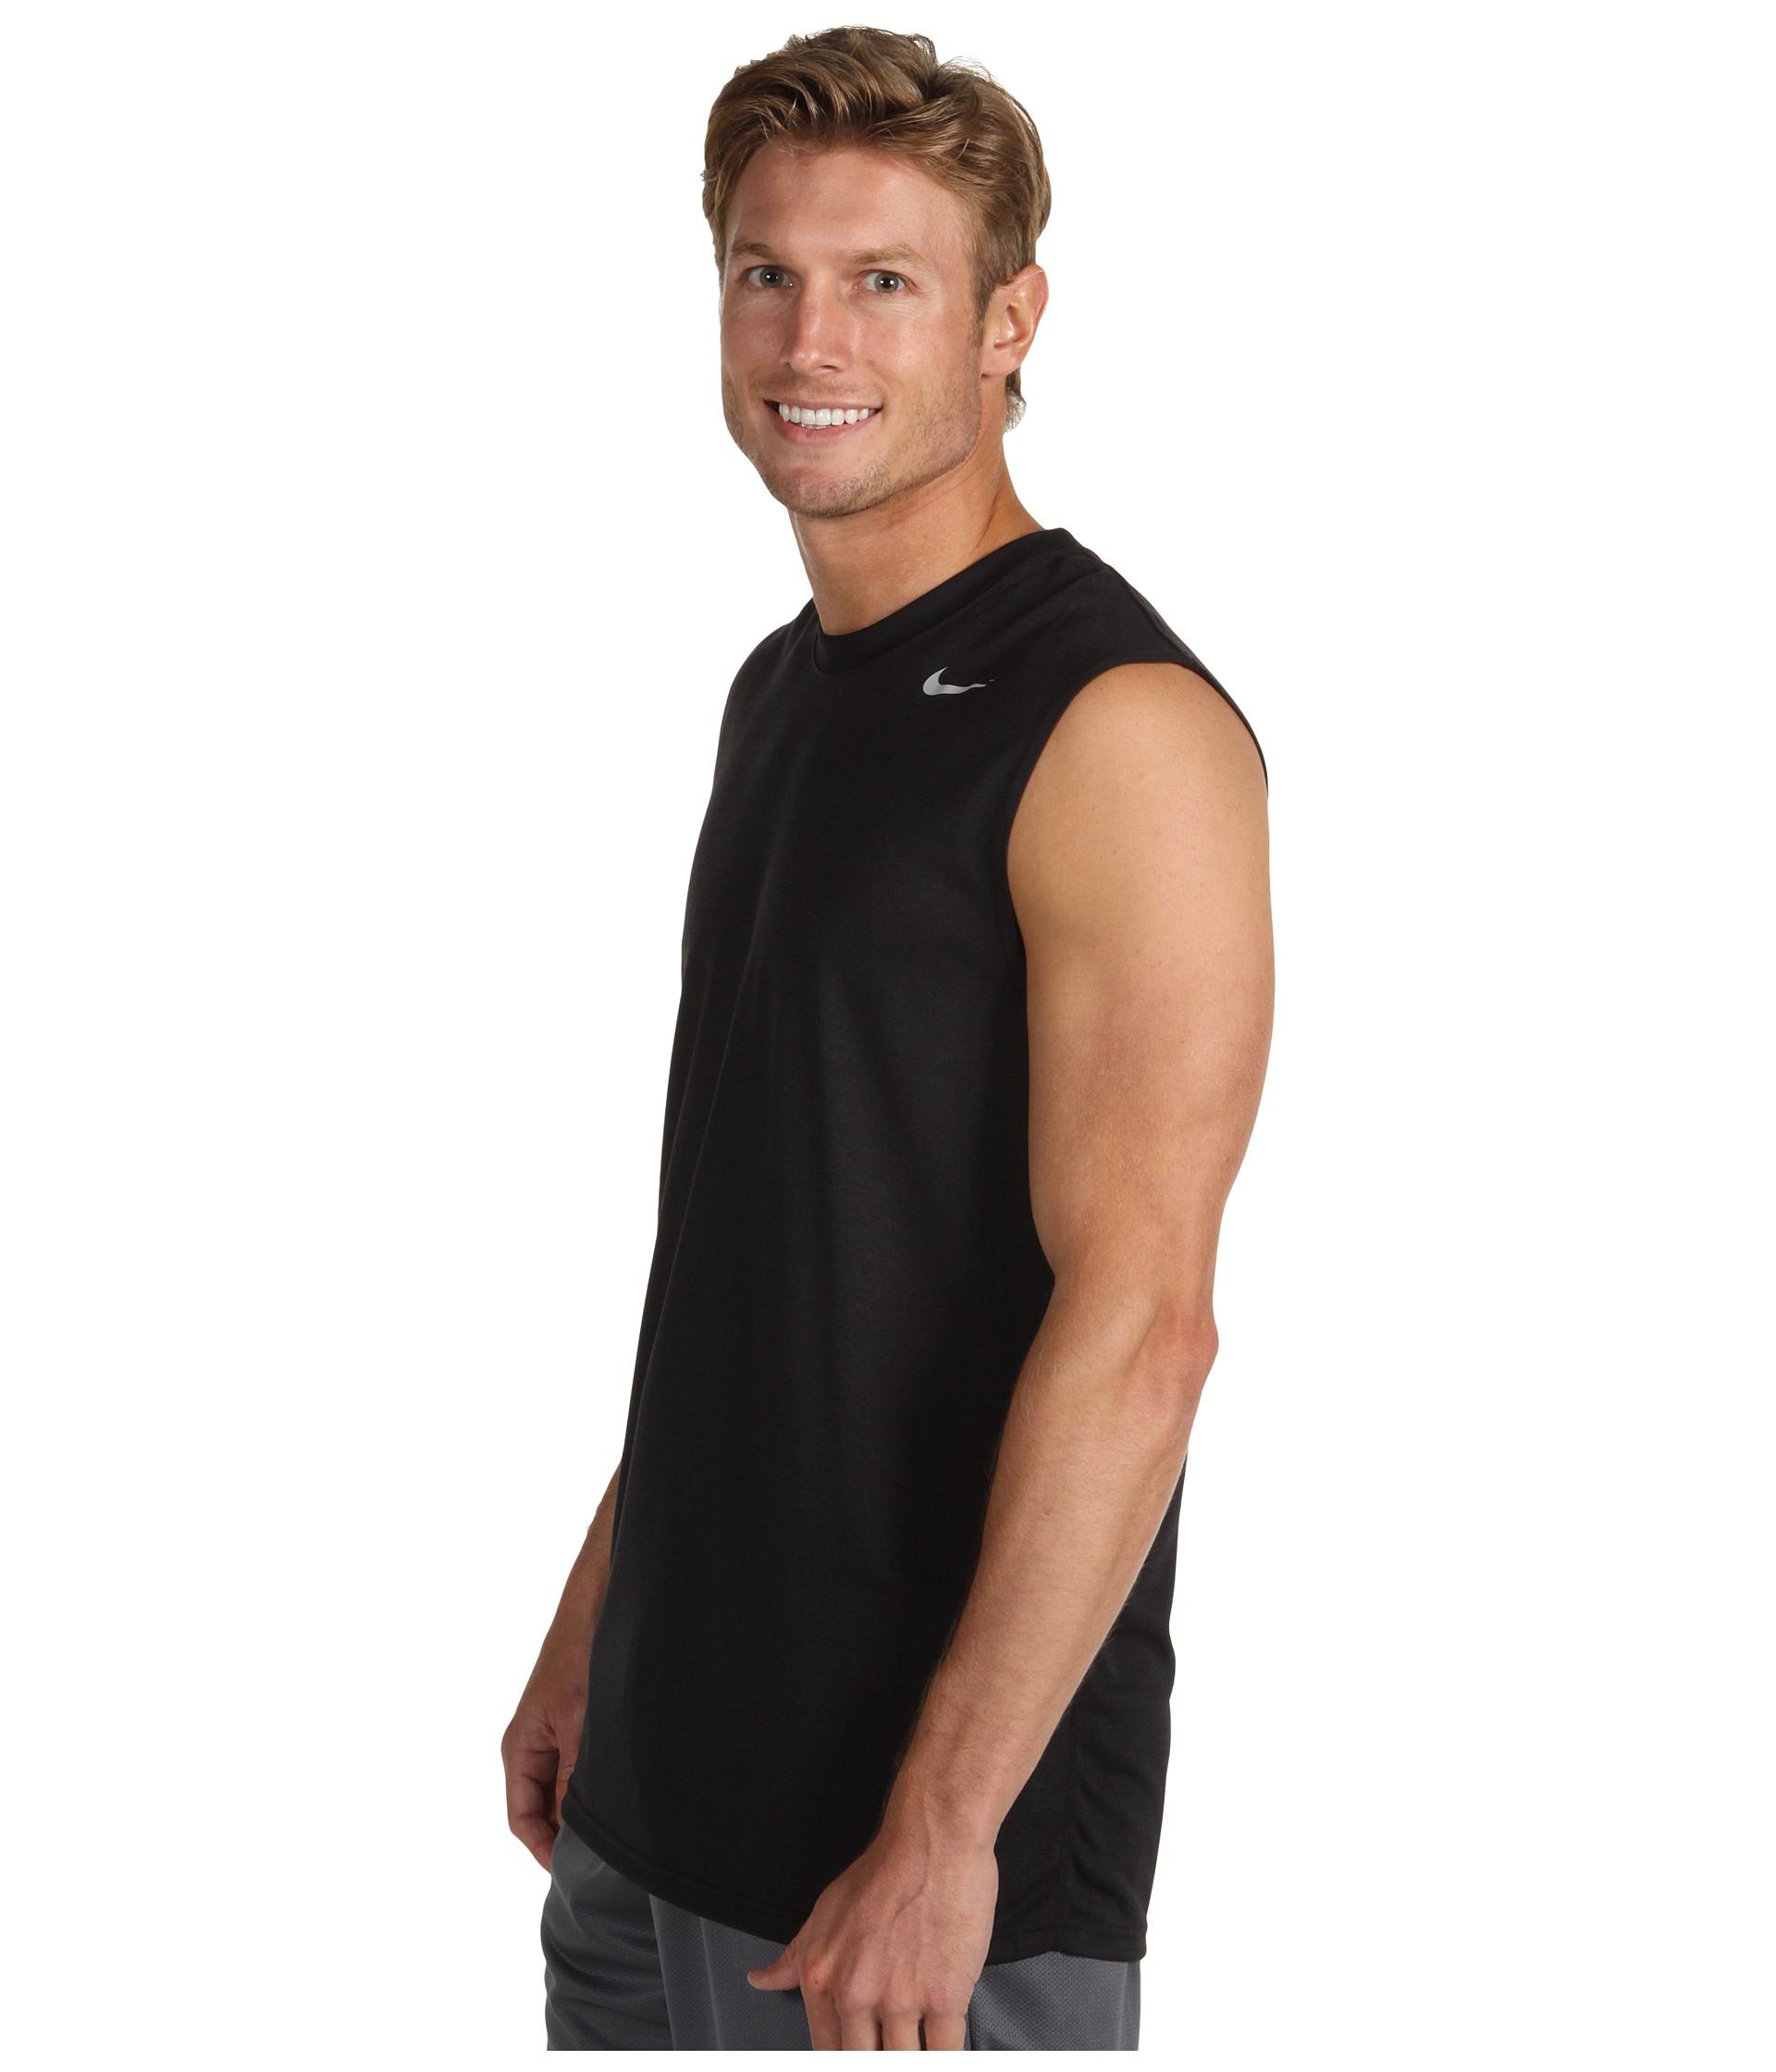 b406f79b Nike Dri-Fit™ Legend Sleeveless Training Shirt in Black for Men - Lyst